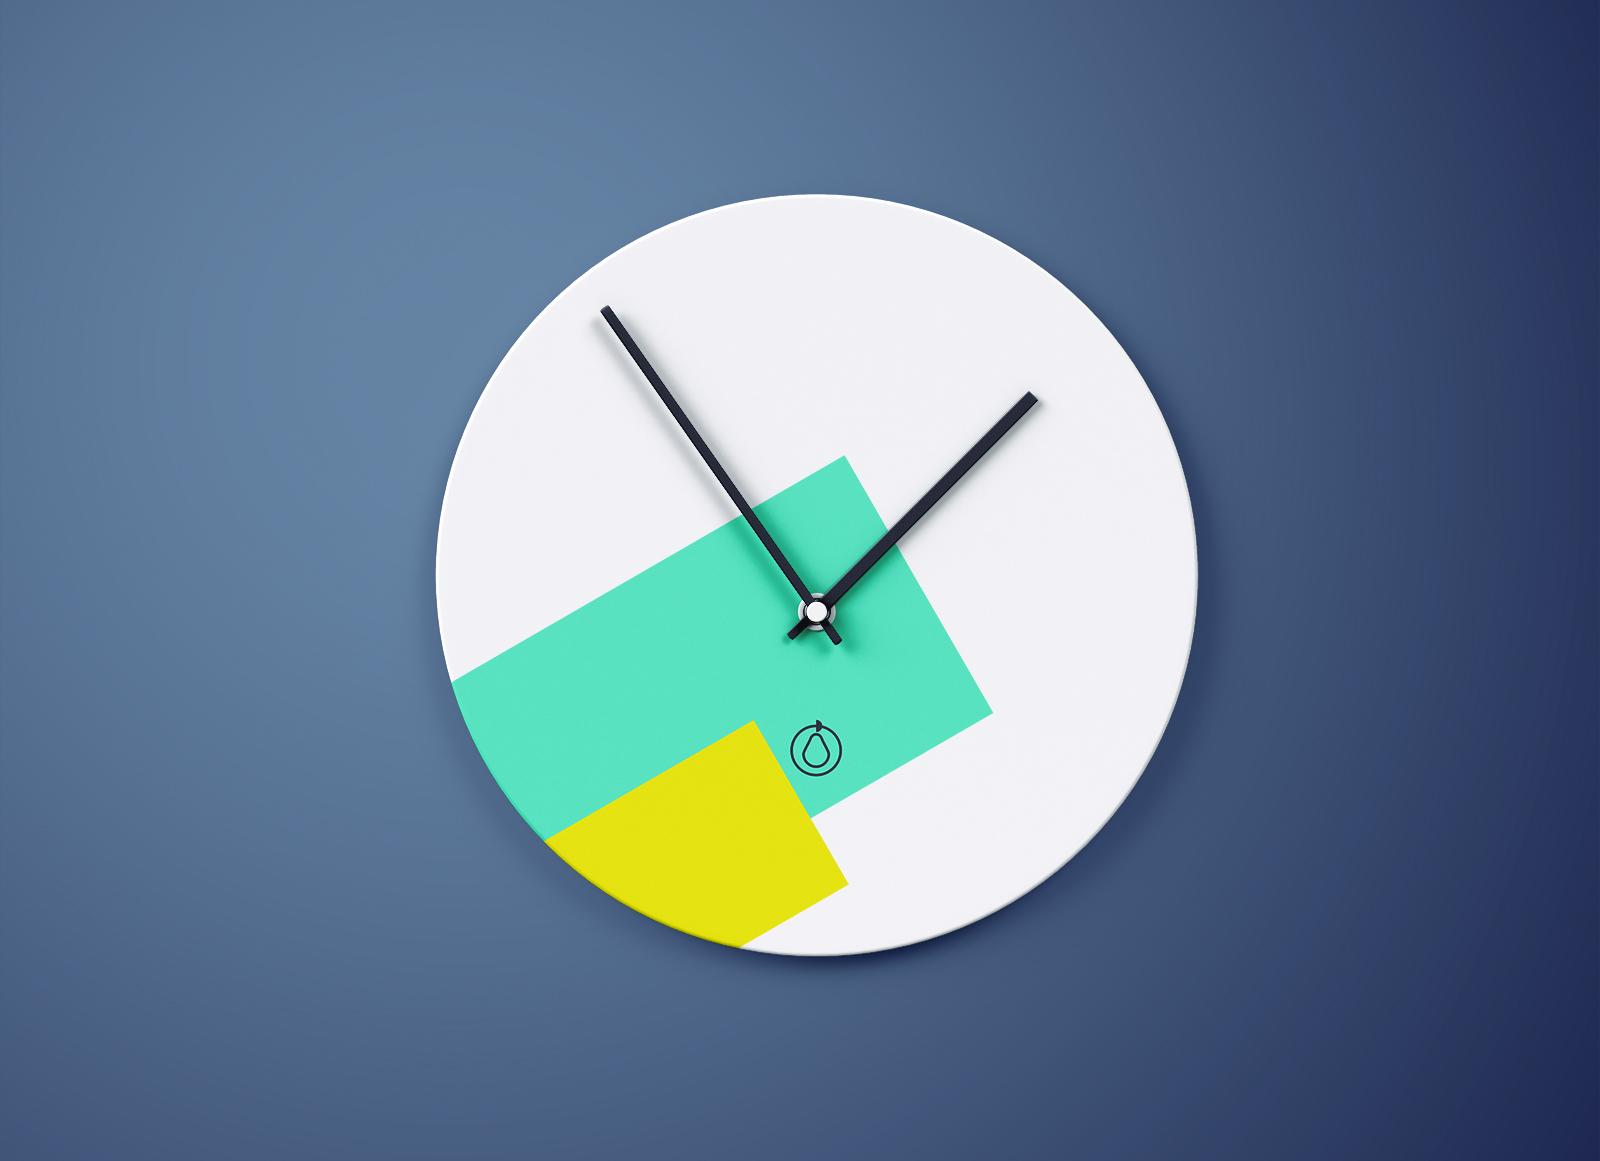 Free-Round-Wall-Clock-Mockup-PSD-2